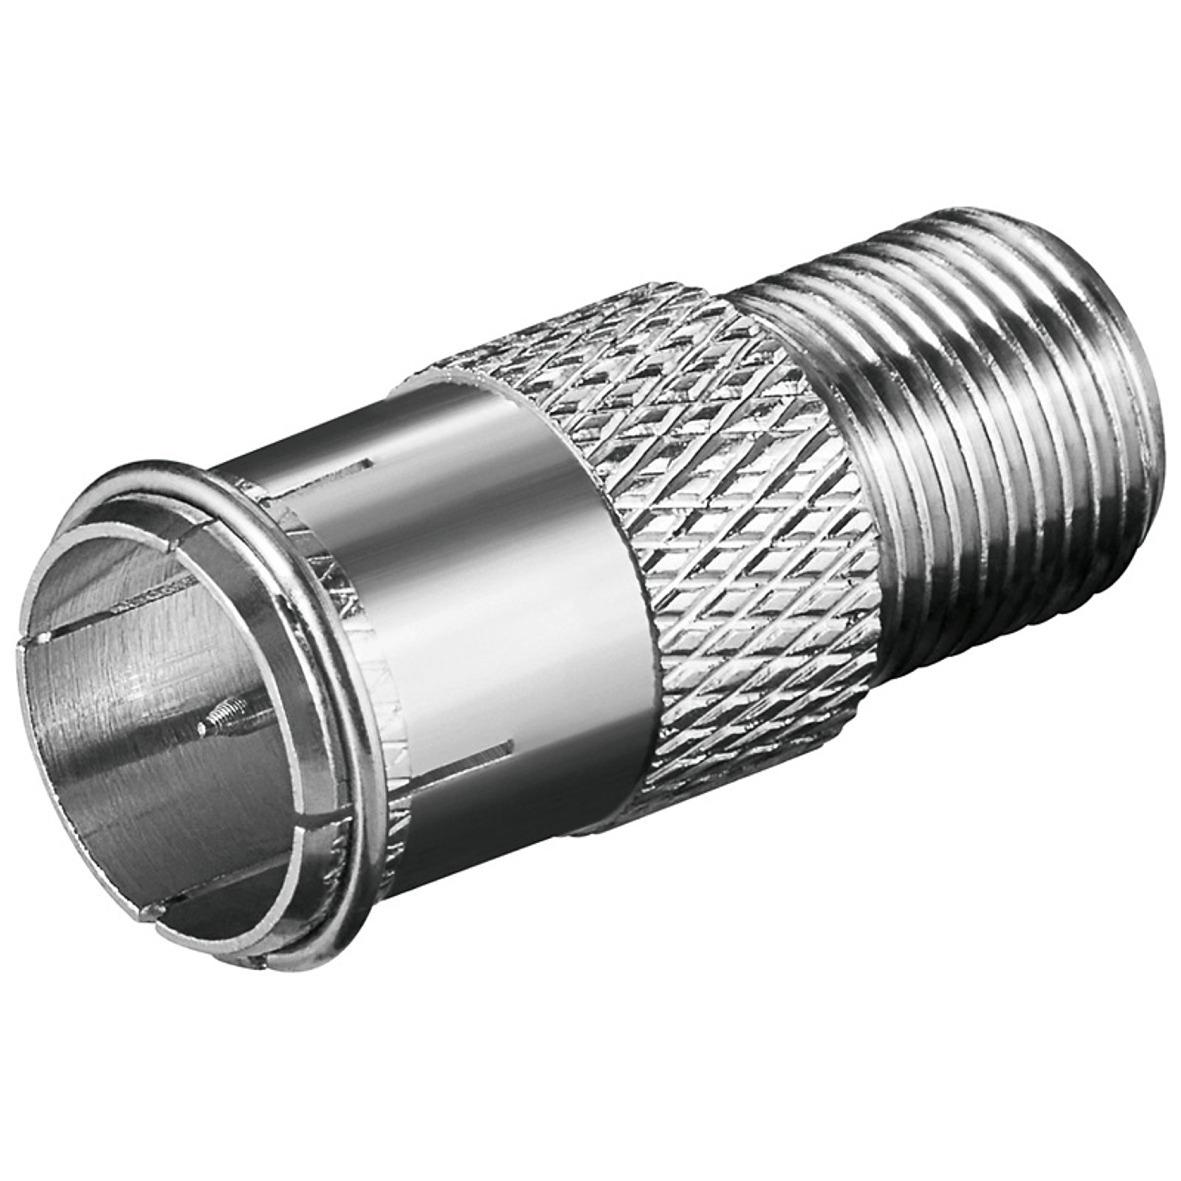 10x kabelverbinder verbinder f stecker kupplung quick kabel verbinden koax sat ebay. Black Bedroom Furniture Sets. Home Design Ideas